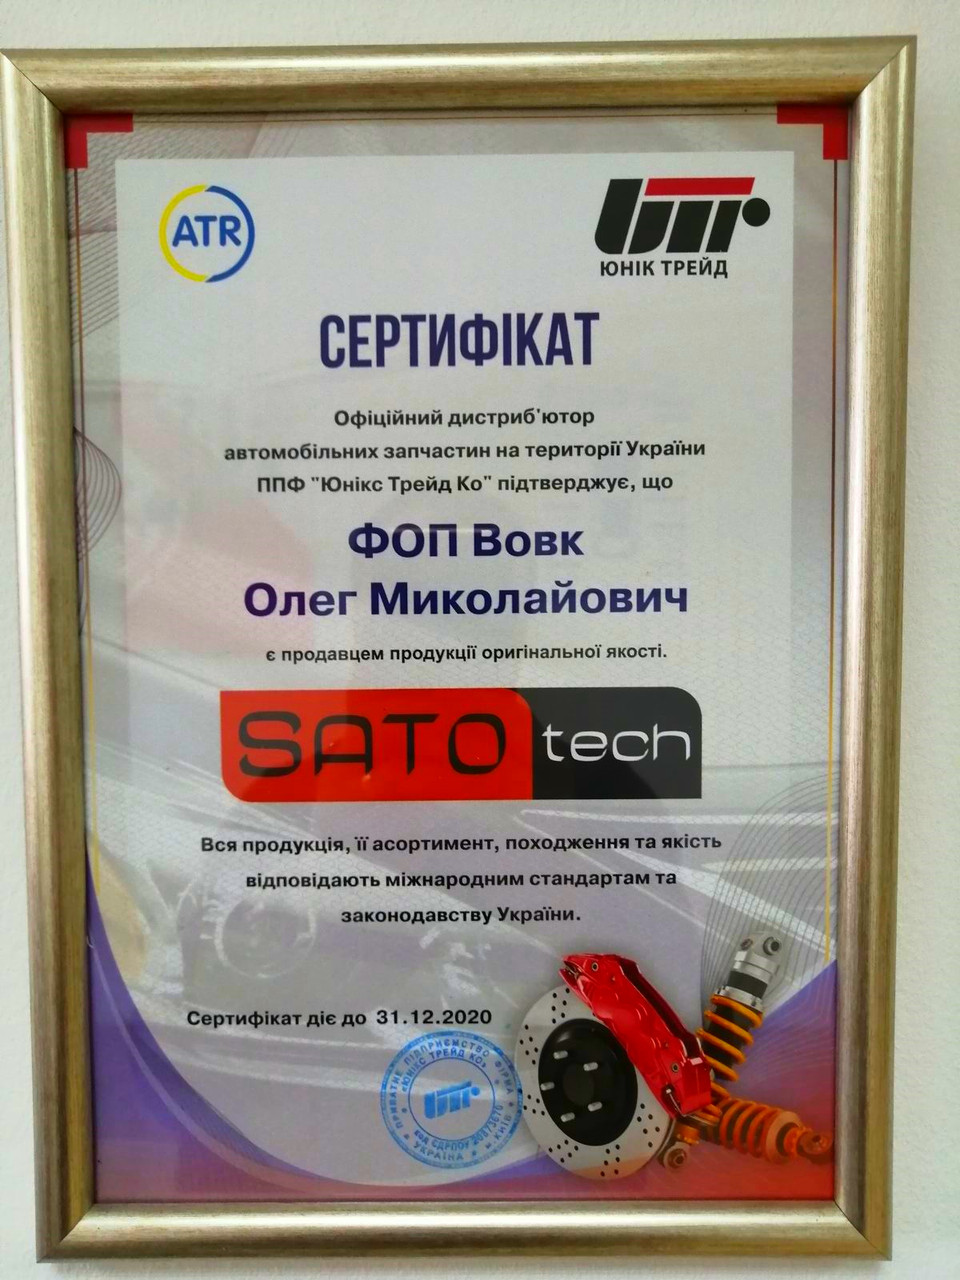 SATO Амортизатор BMW 3 Series (E36) 91-